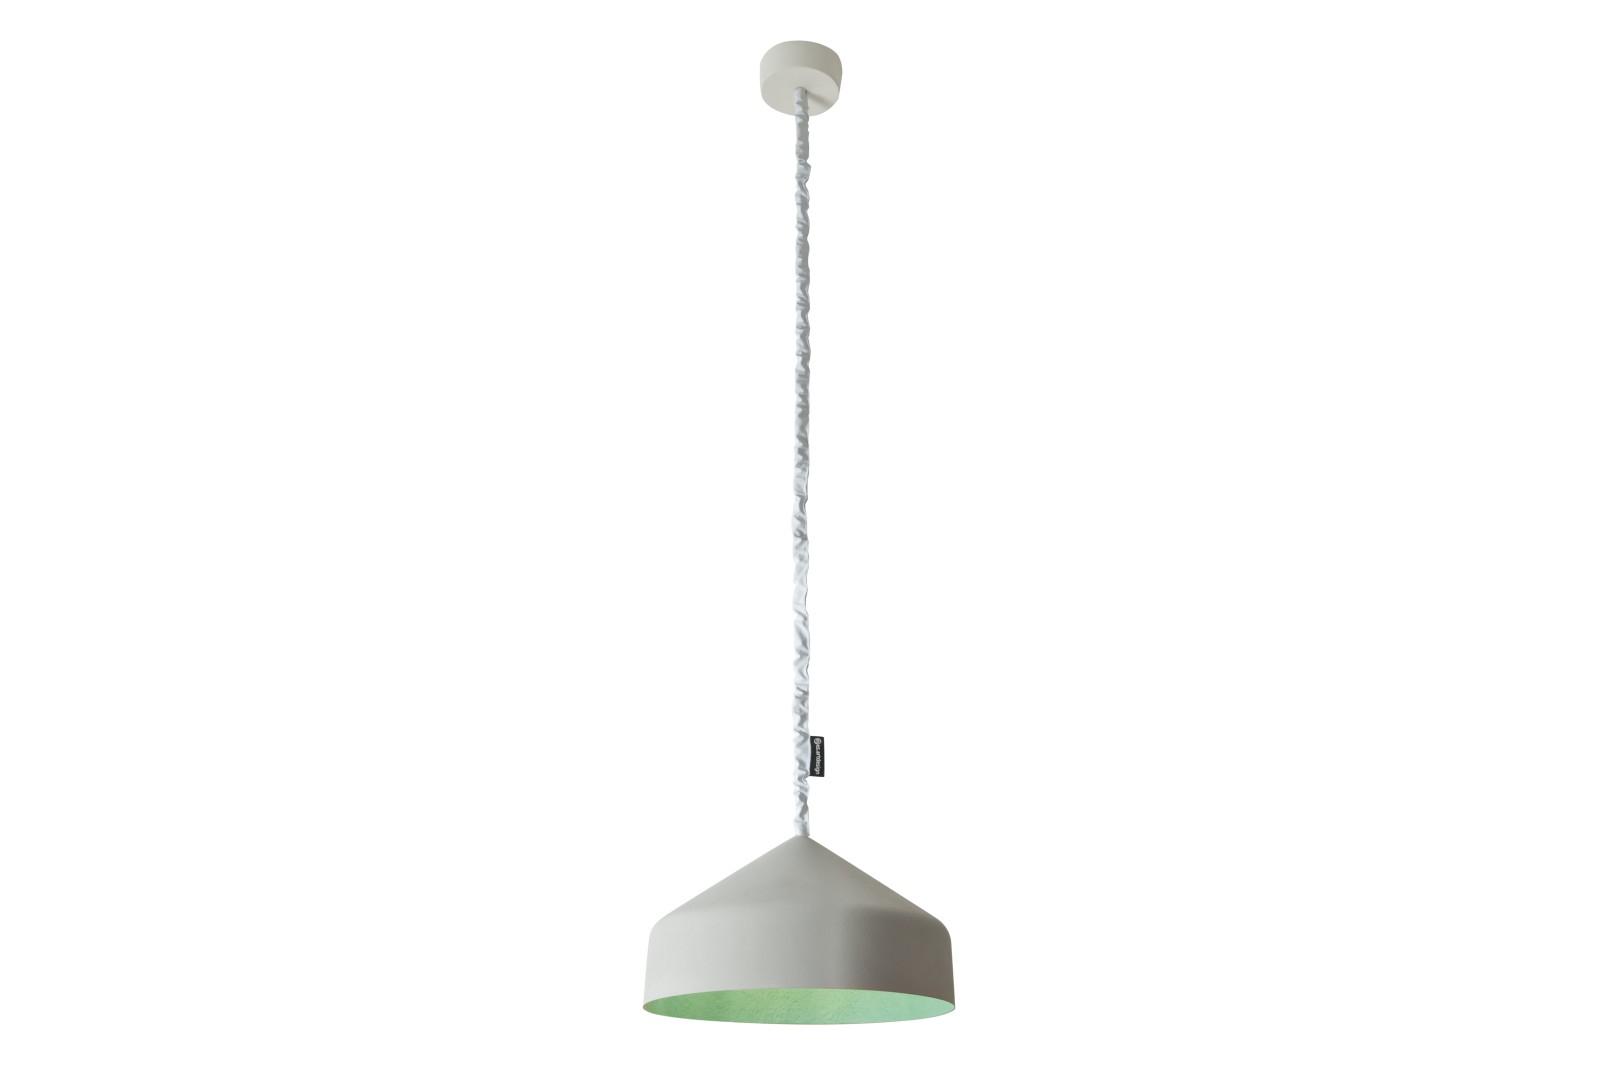 Cyrcus Pendant Light Cemento, Grey, Turquoise